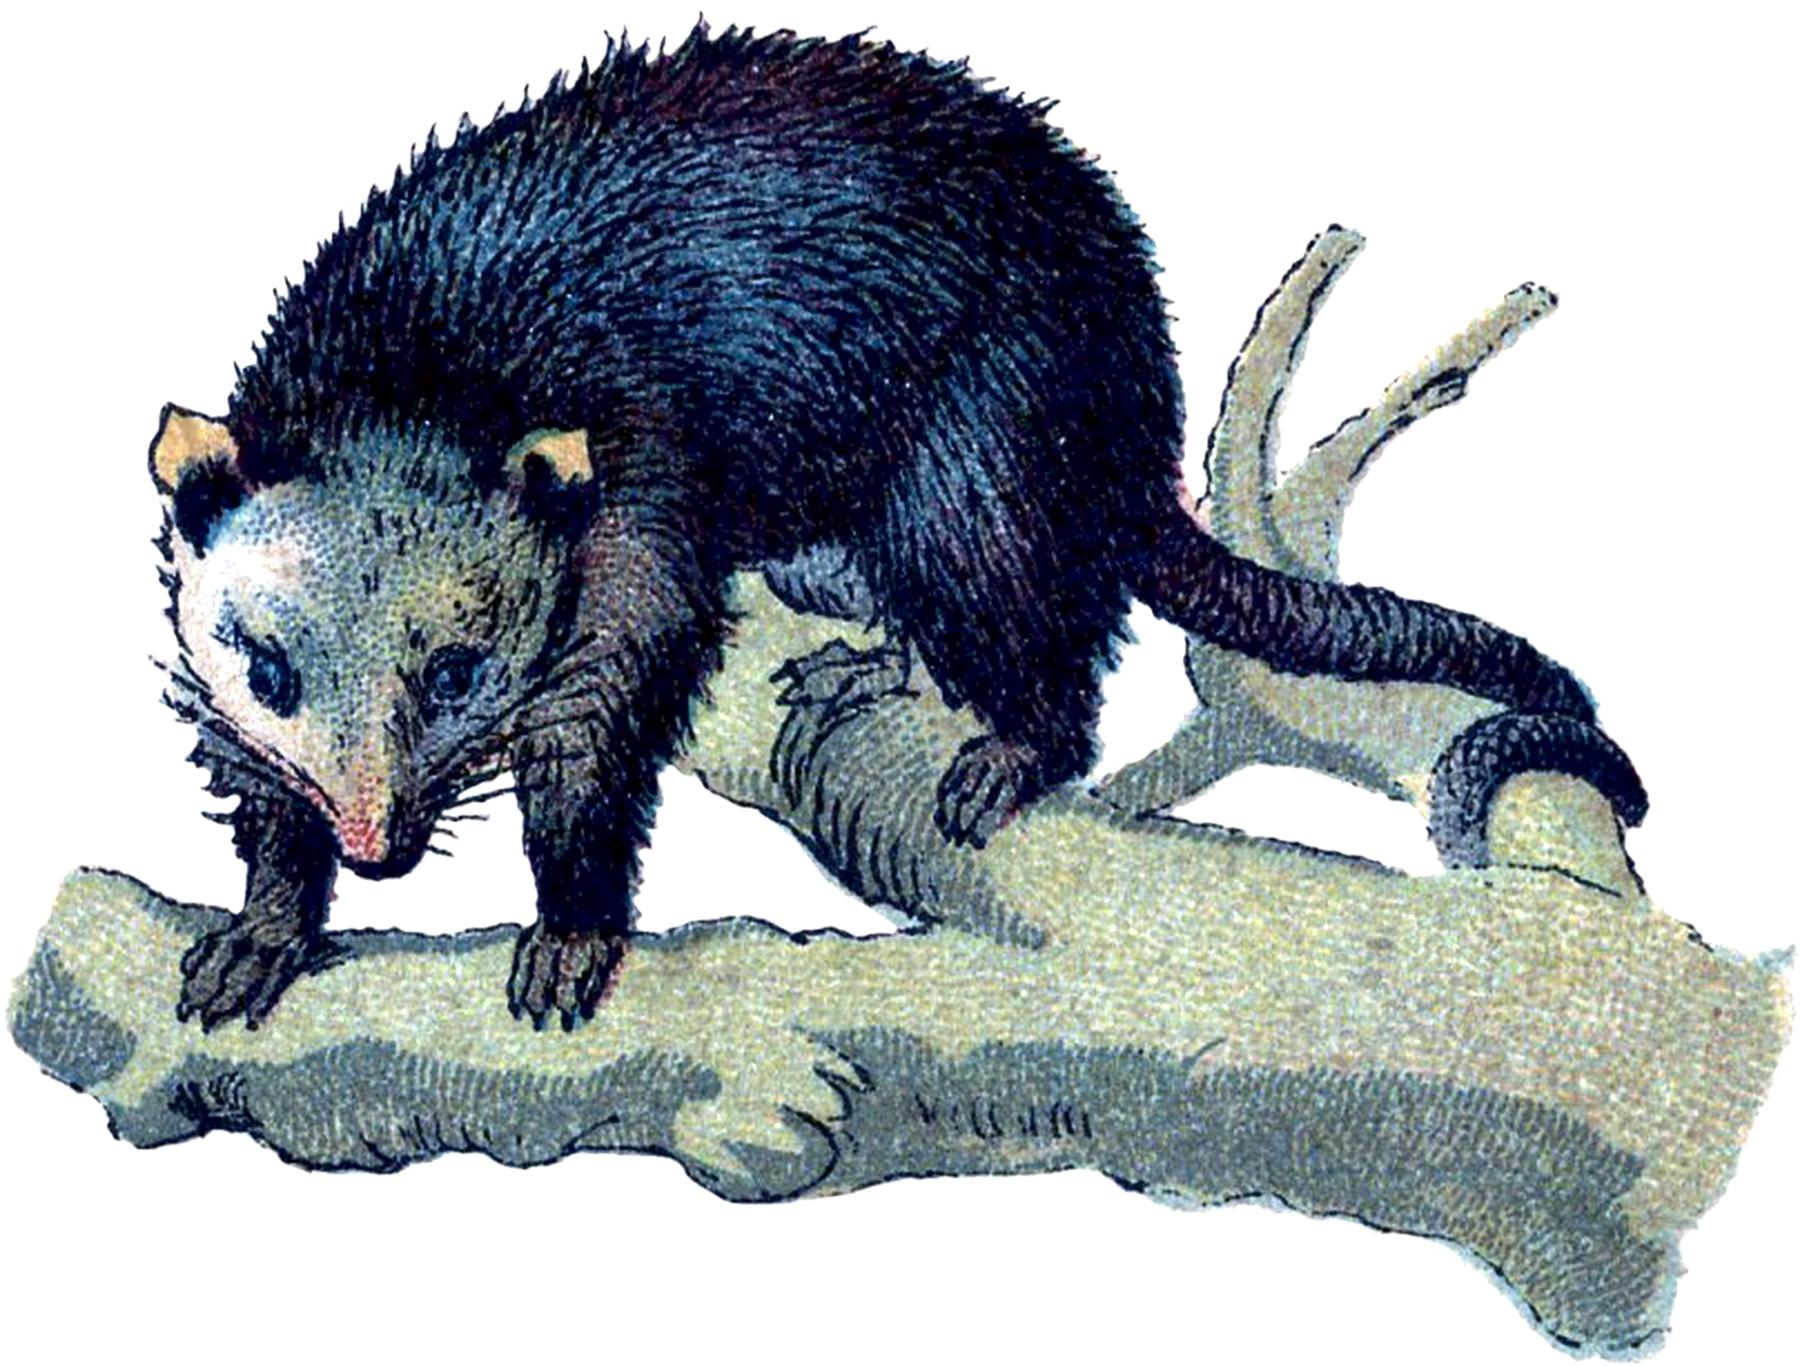 Opossum clipart odd Vintage Fairy Graphics Image? The